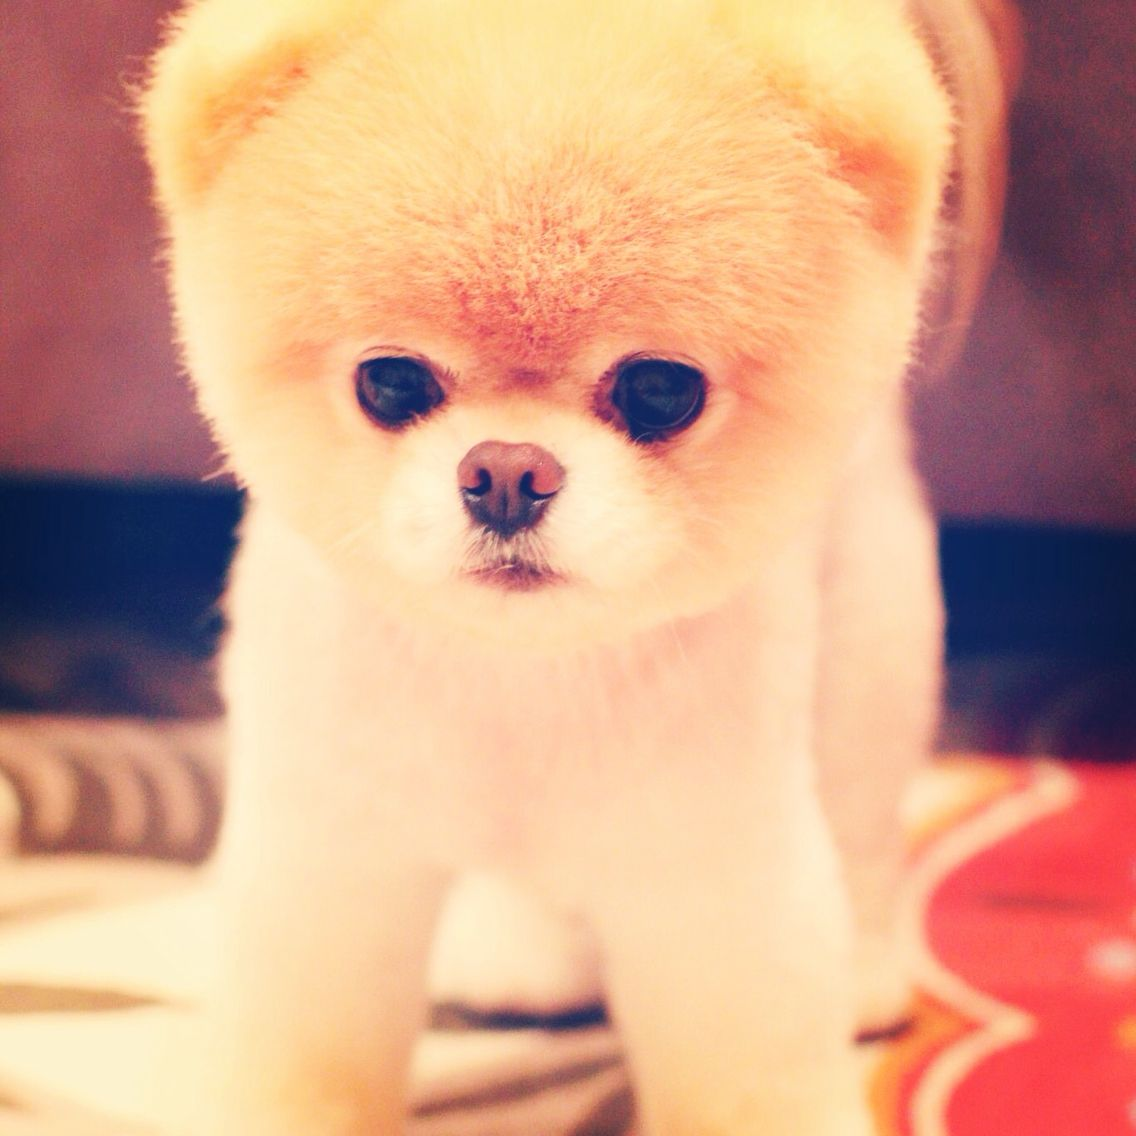 Fantastic Pinterest Chubby Adorable Dog - c487b91bd93b798fee2d8765036fd895  HD_617145  .jpg